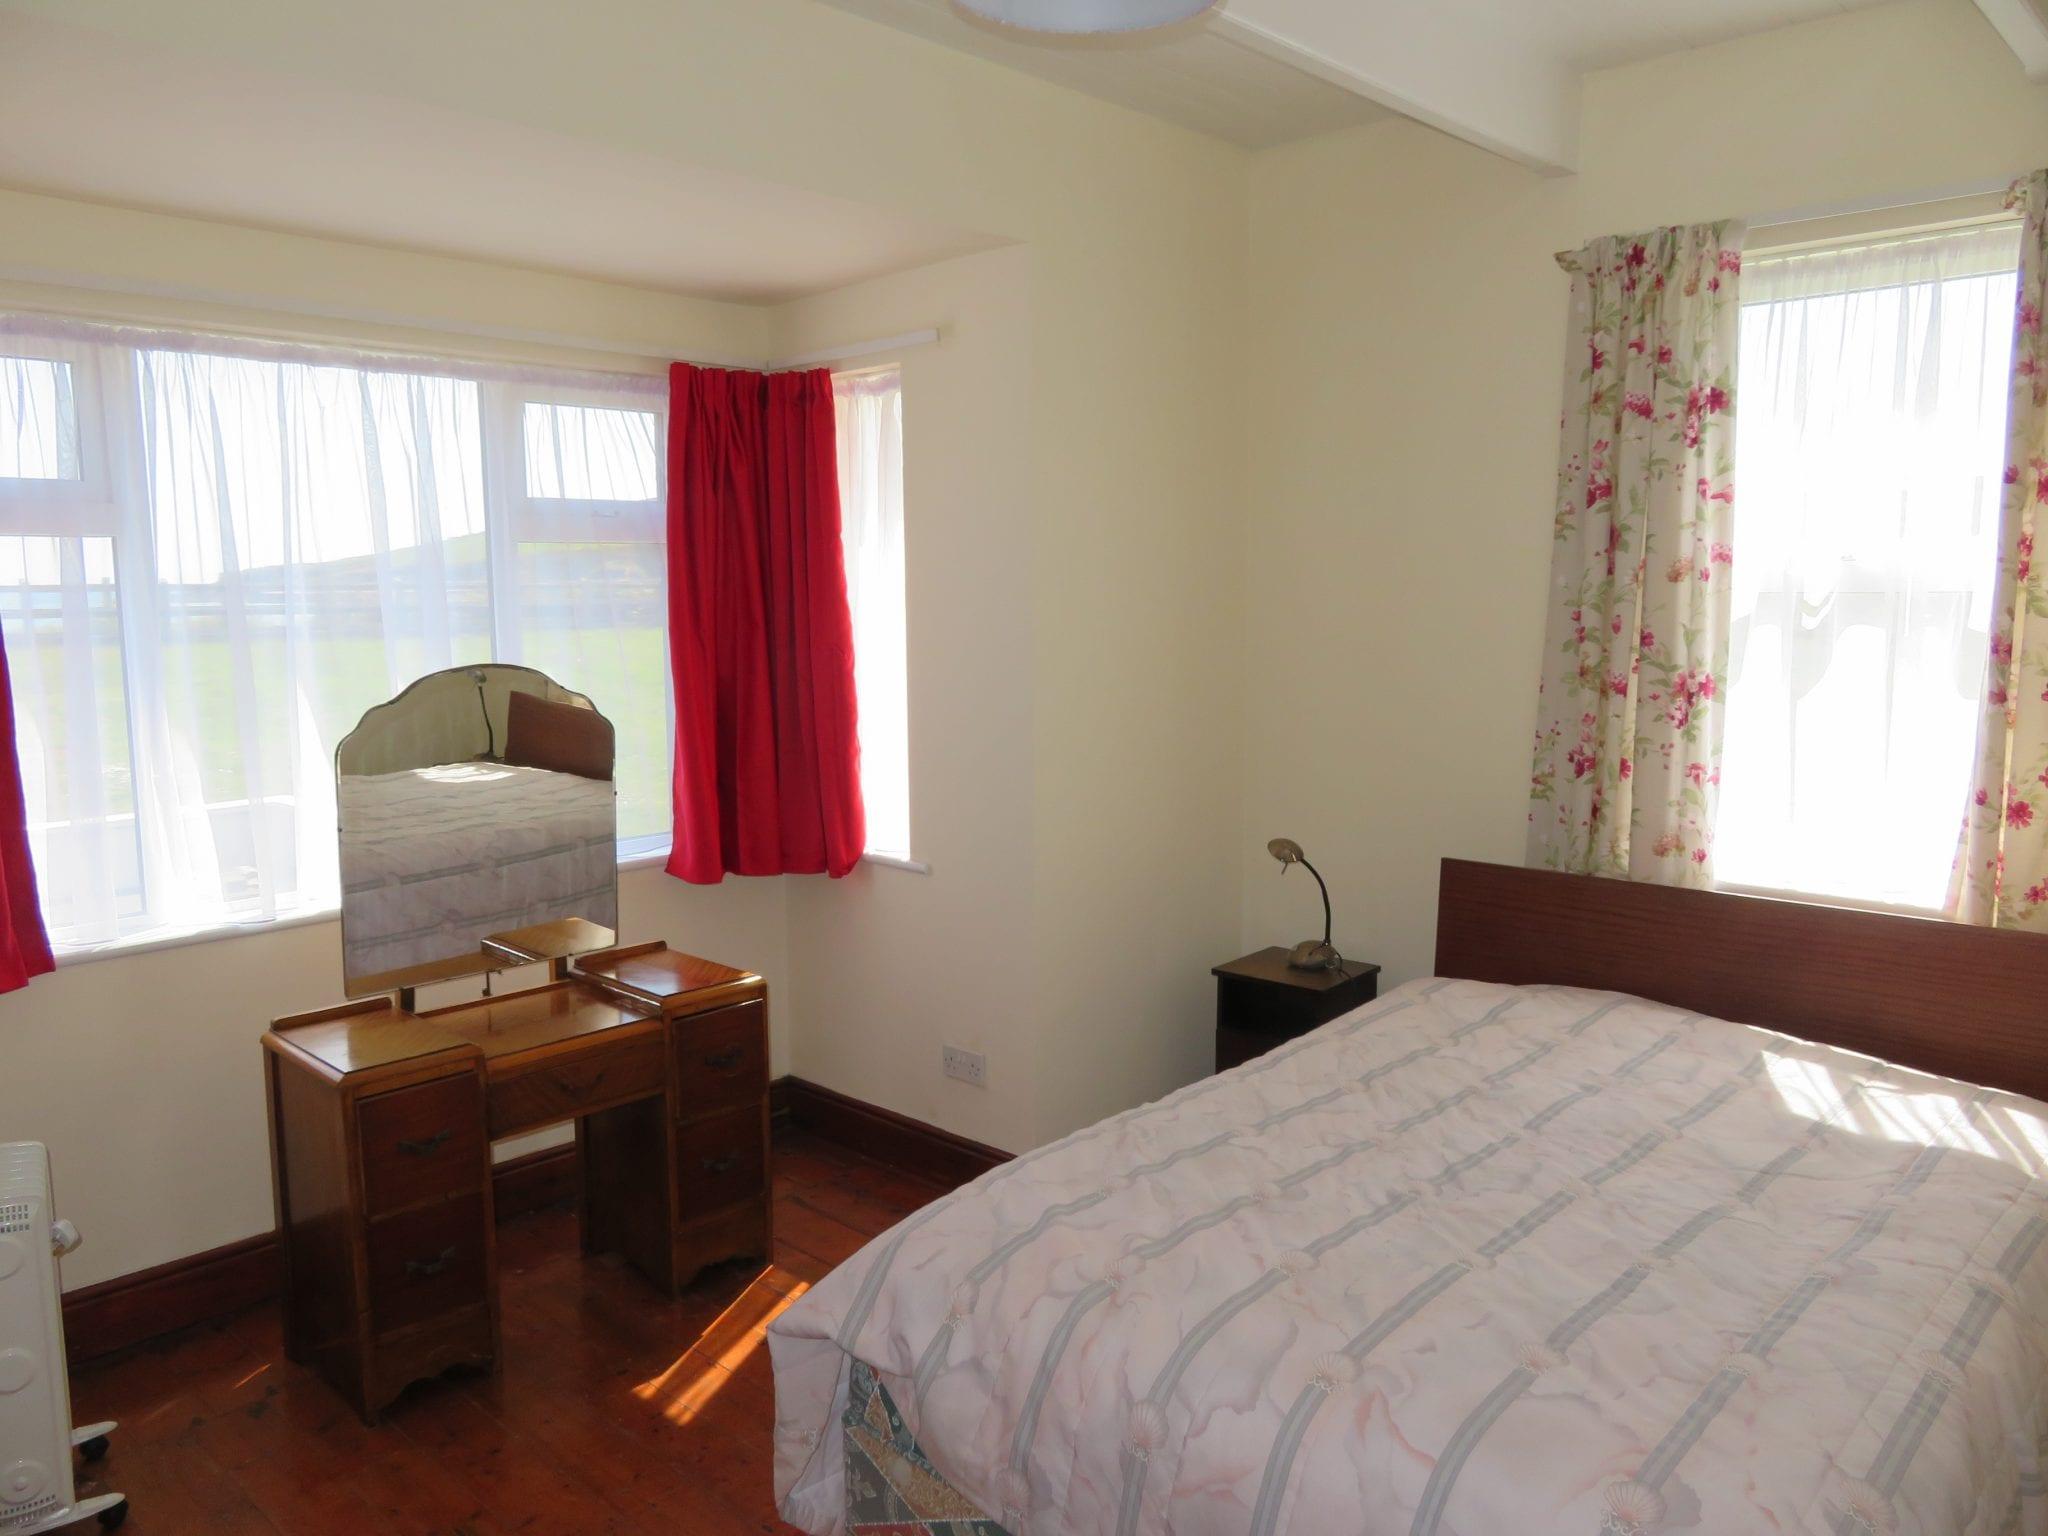 IMG_0023 - bedroom